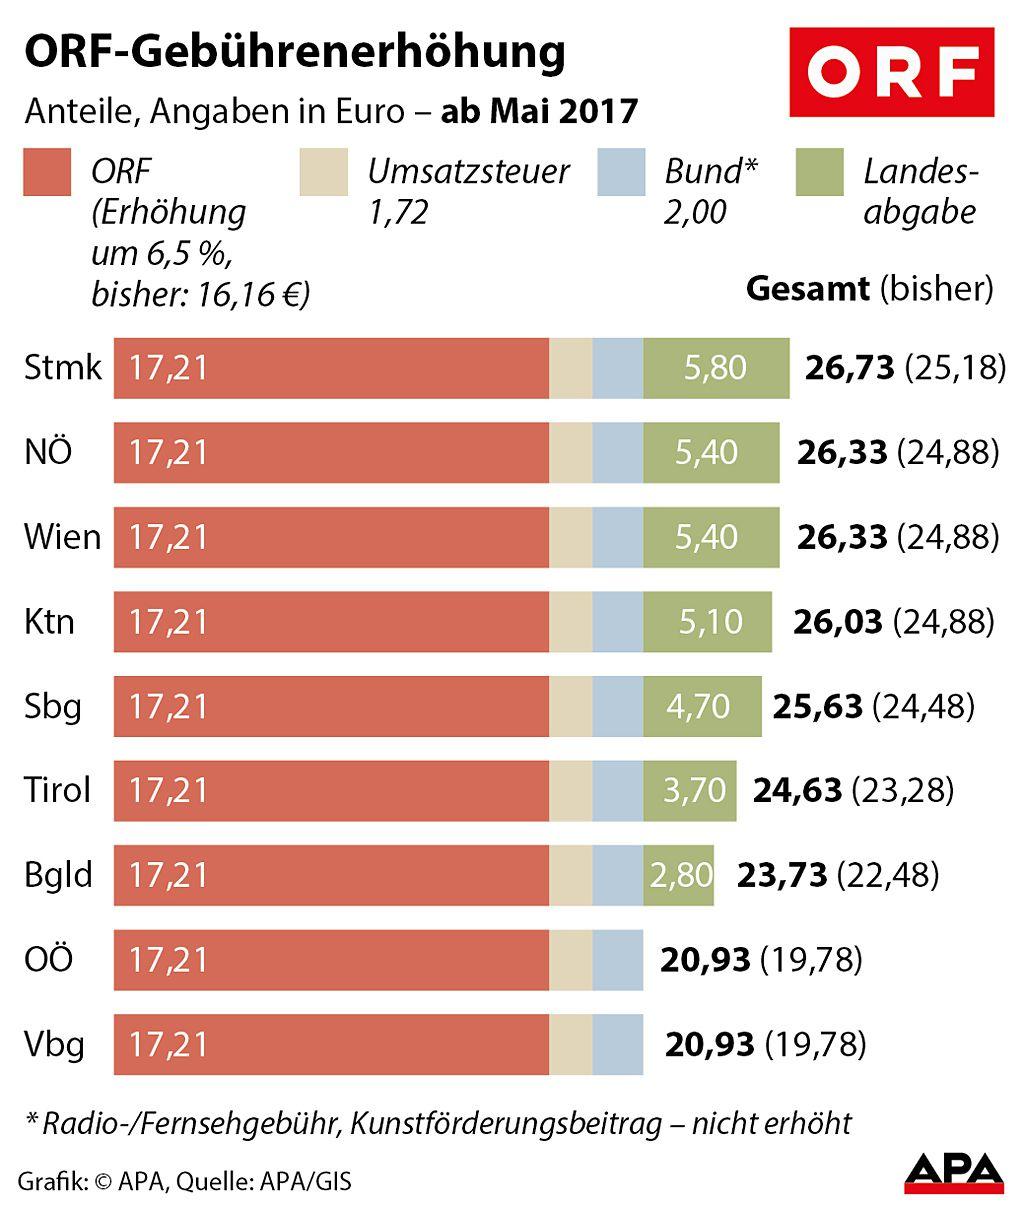 Grafik: Die ORF-Gebührenerhöhung